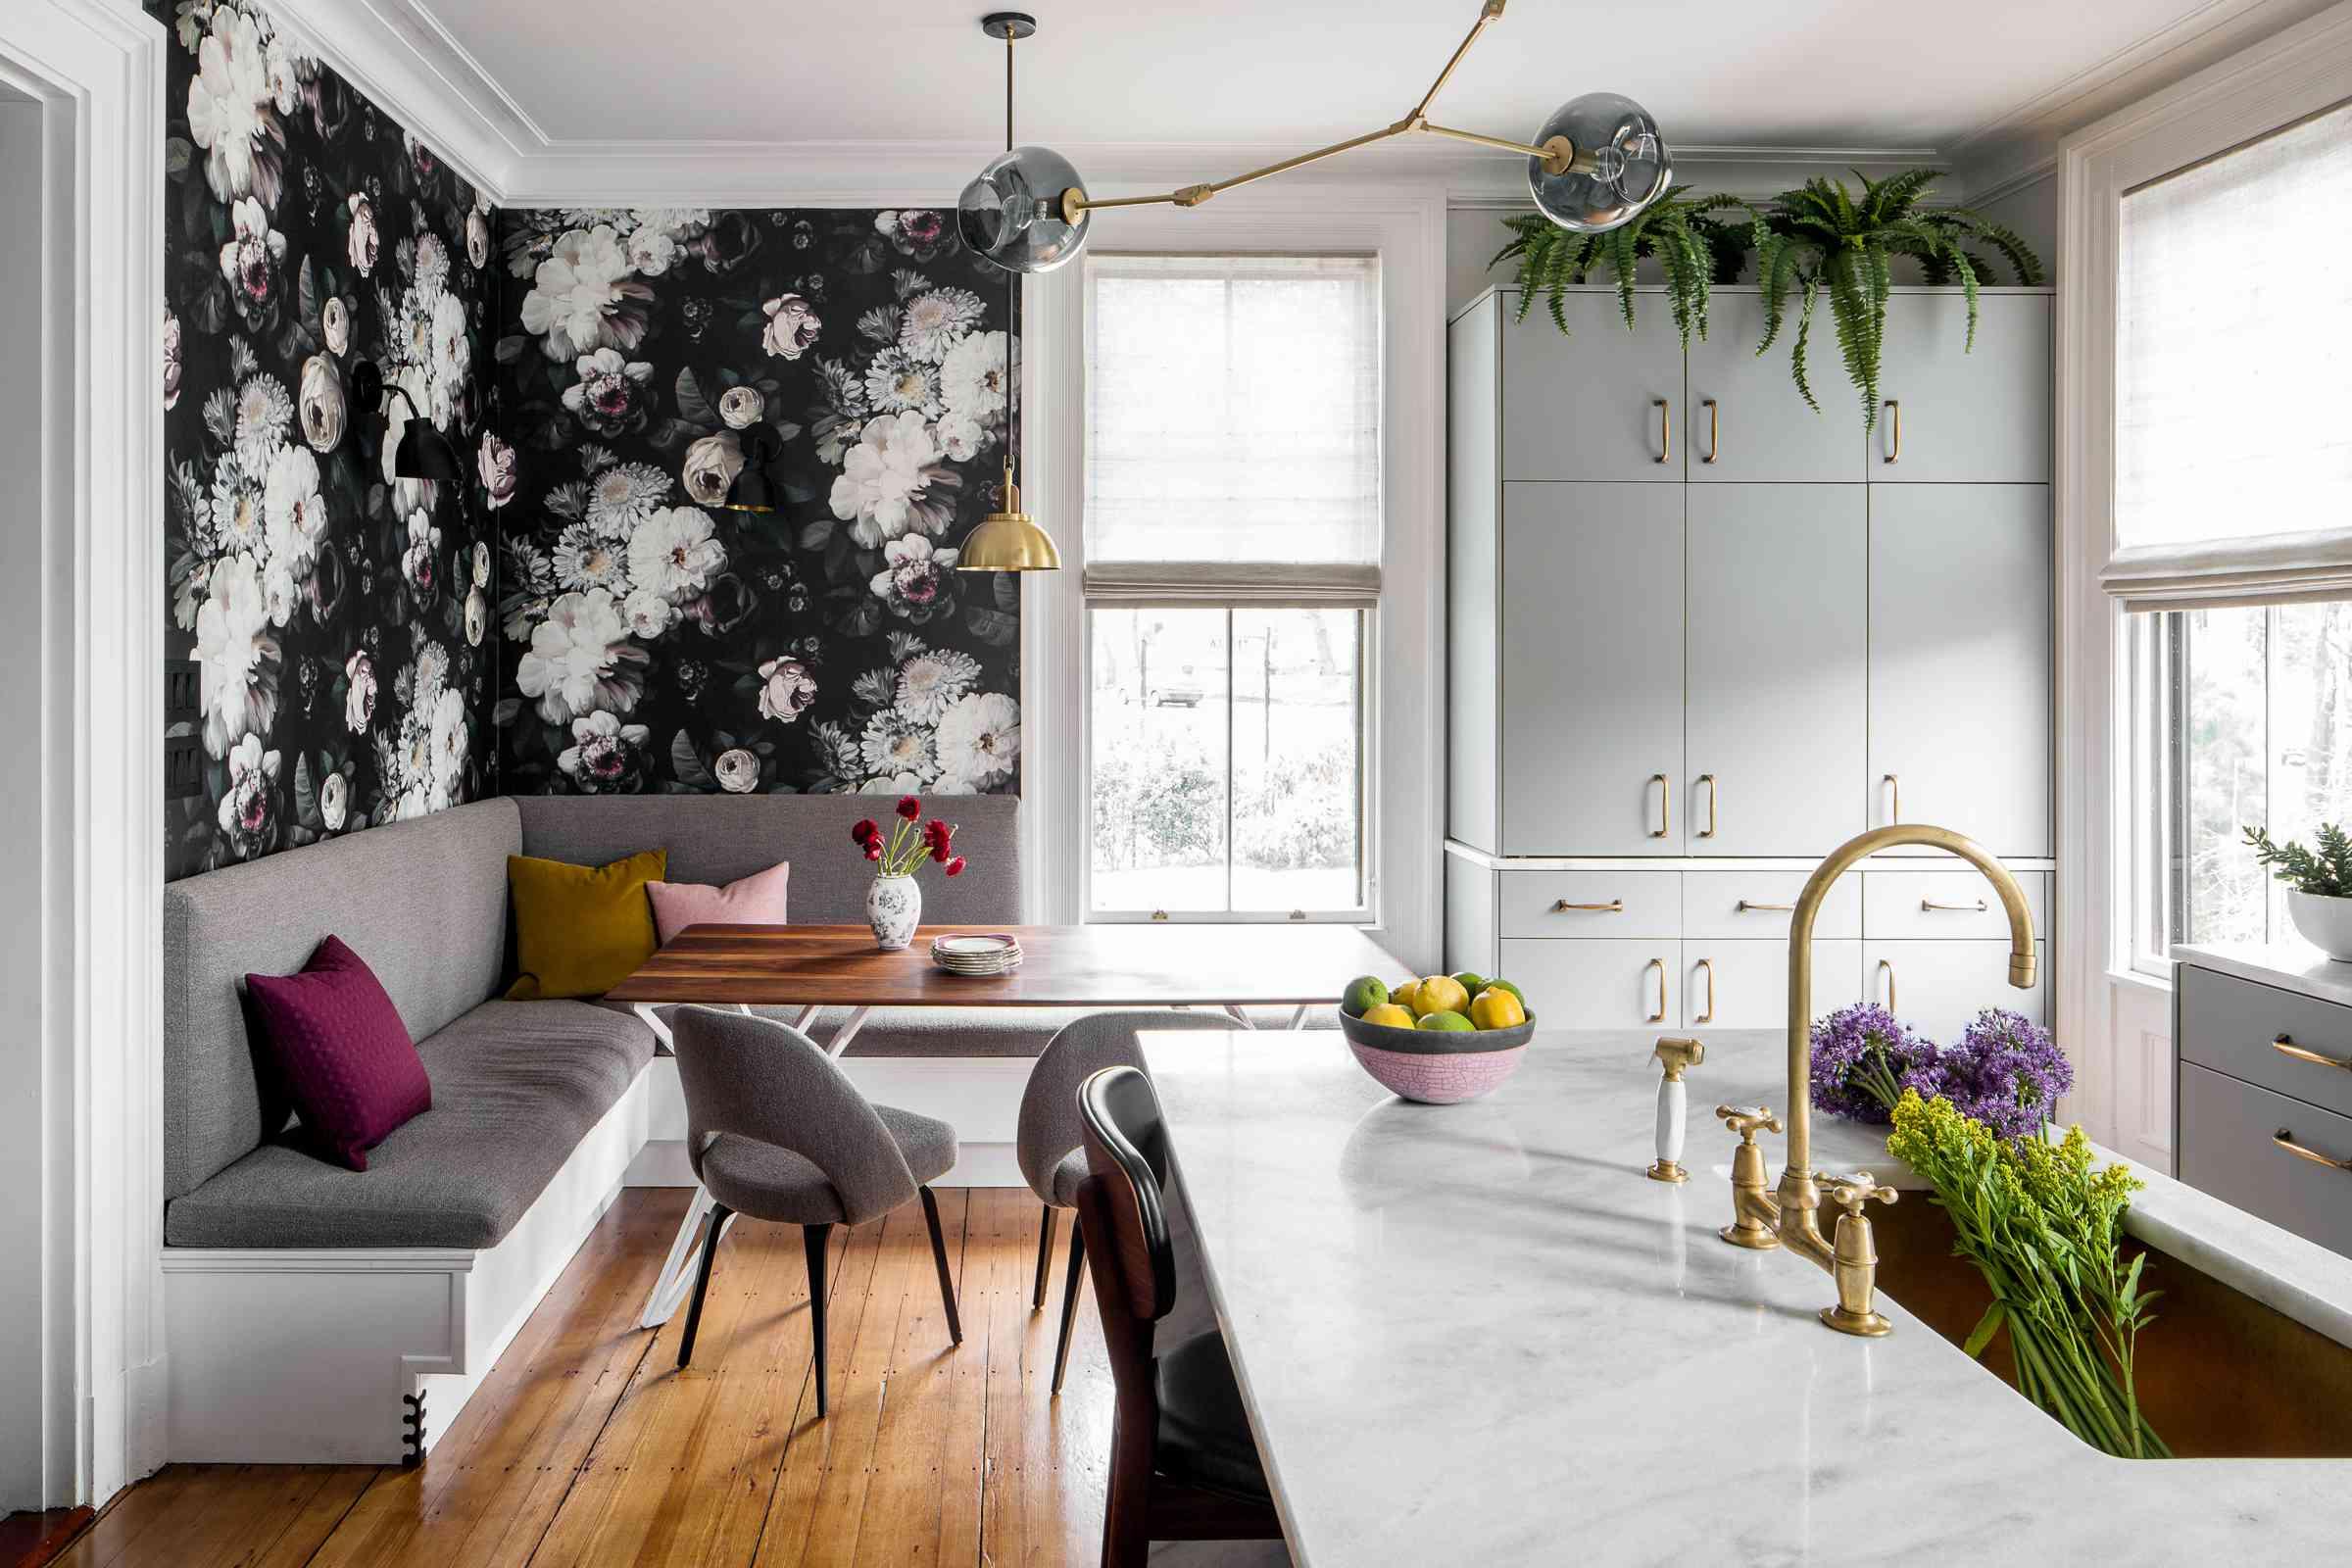 10 Kitchen Wall Decor Ideas   Create Original Kitchen Wall Art